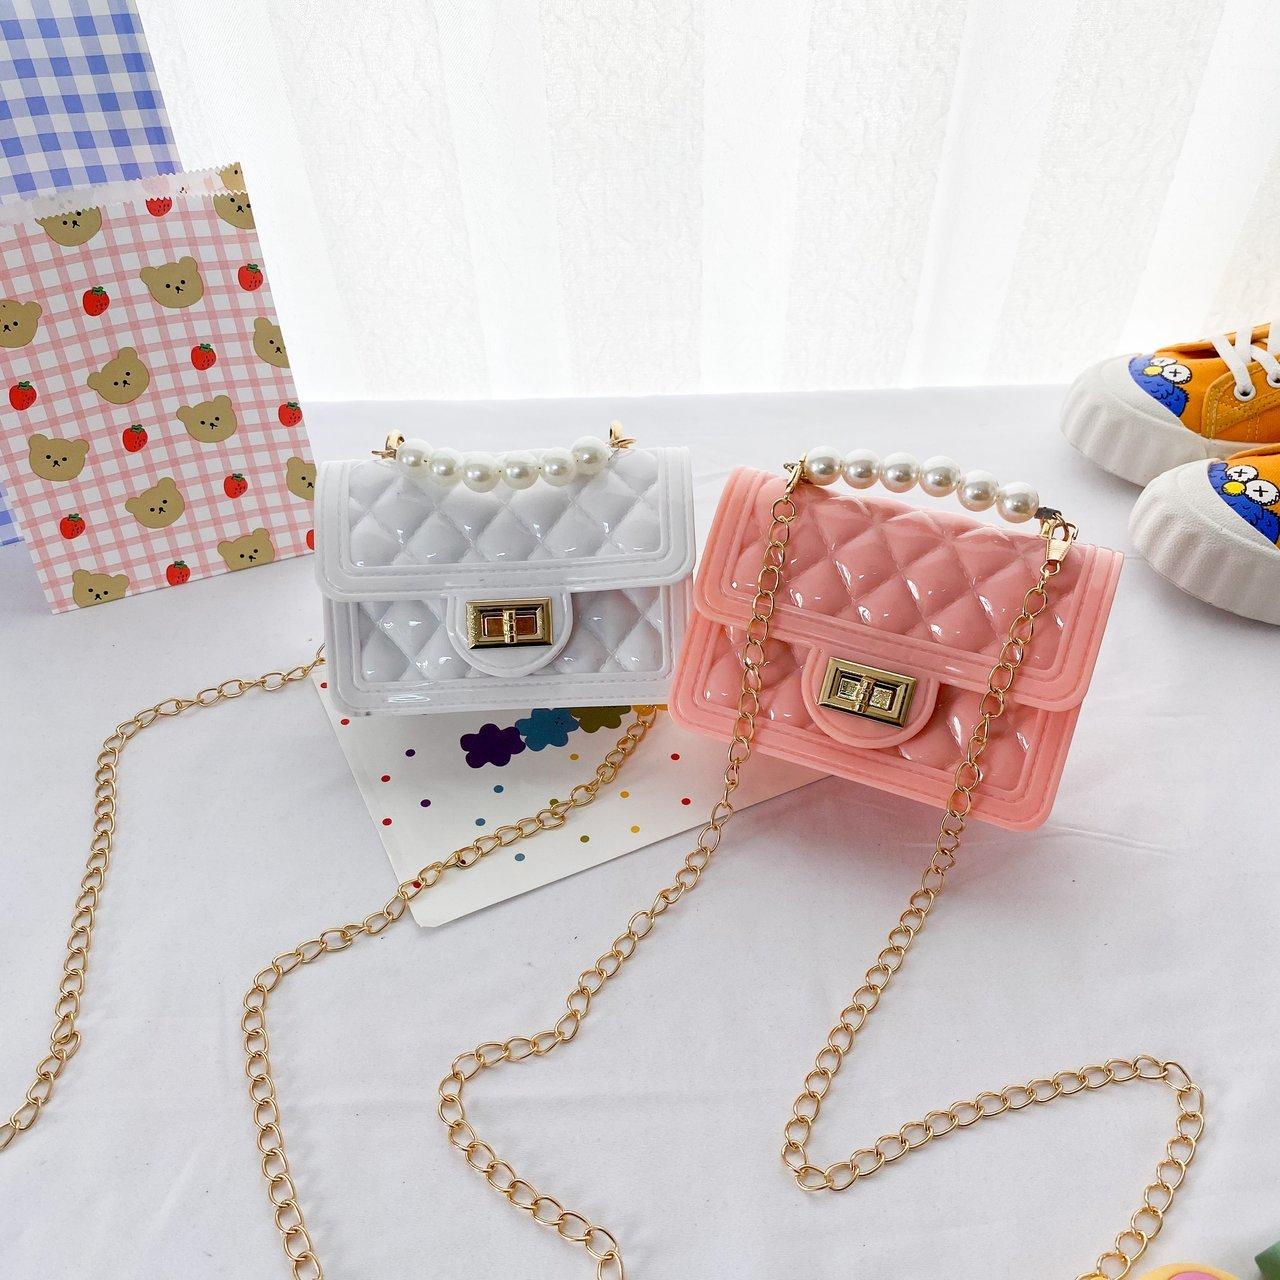 2021 Candy Color Mini Pearl Chain Plaid Women Bags Designer Purse Pvc Girls Over the Shoulder Beach Bag